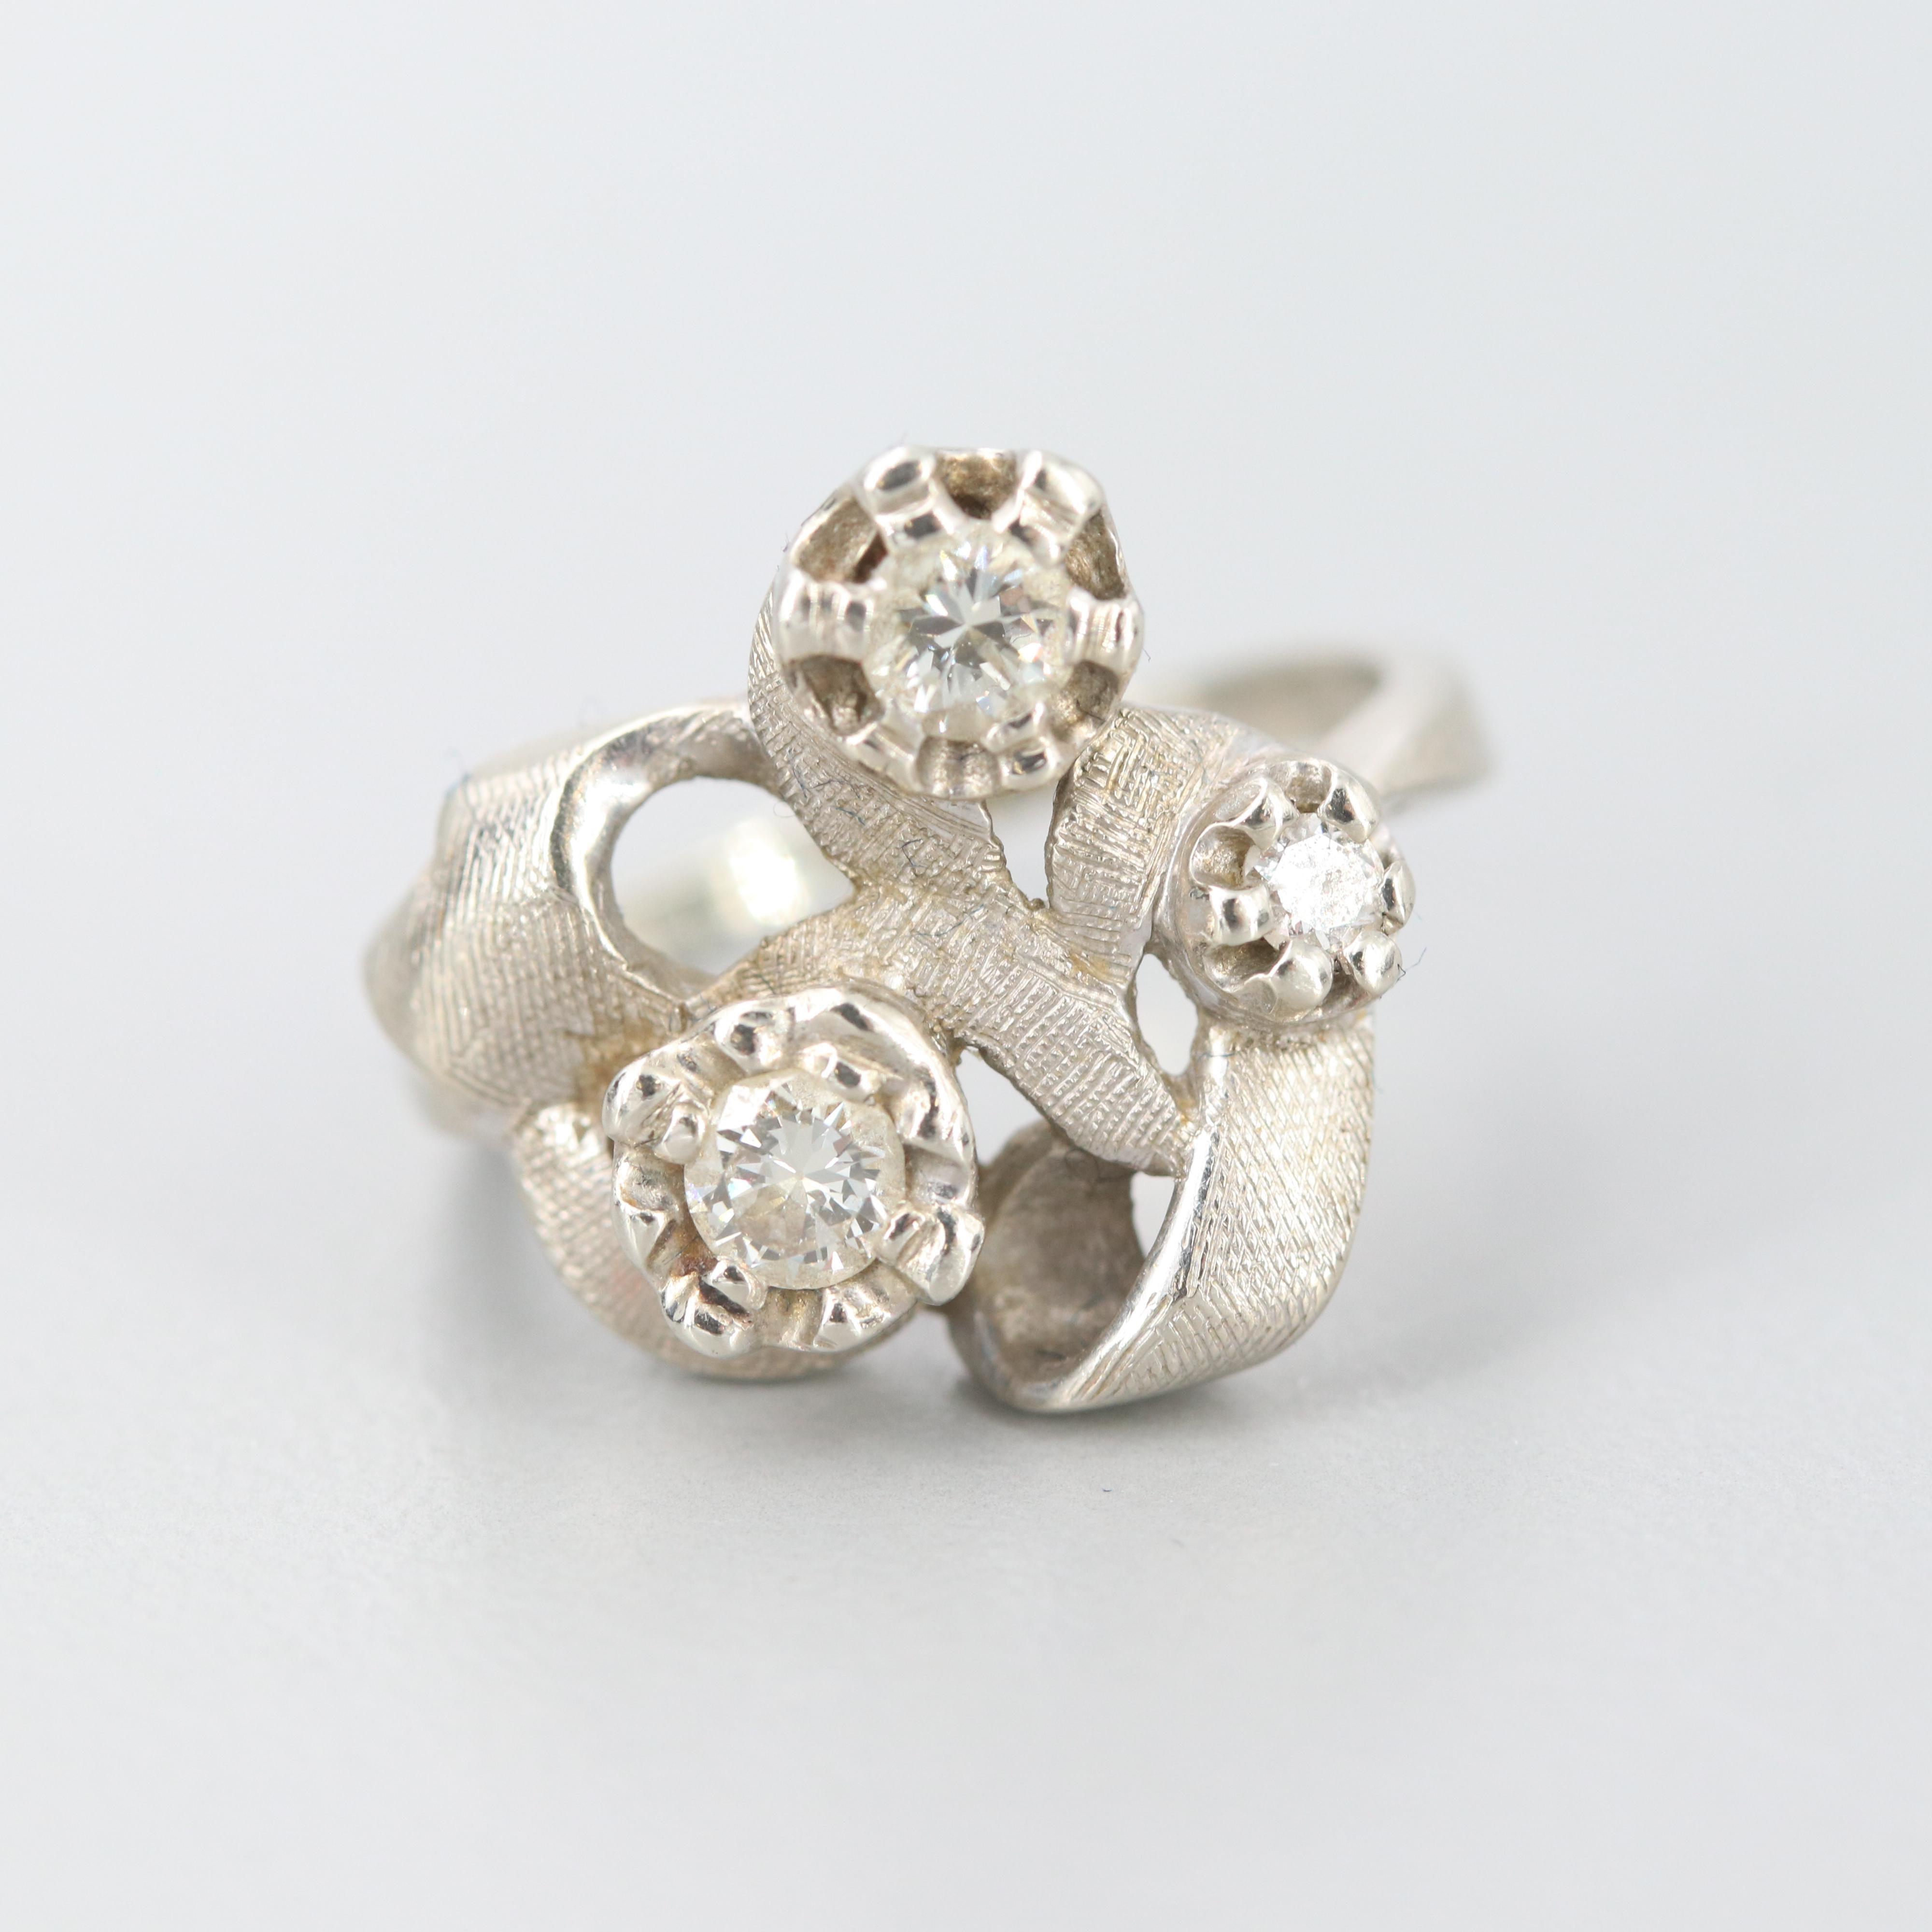 Circa 1950s 14K White Gold Diamond Ring with Florentine Texture